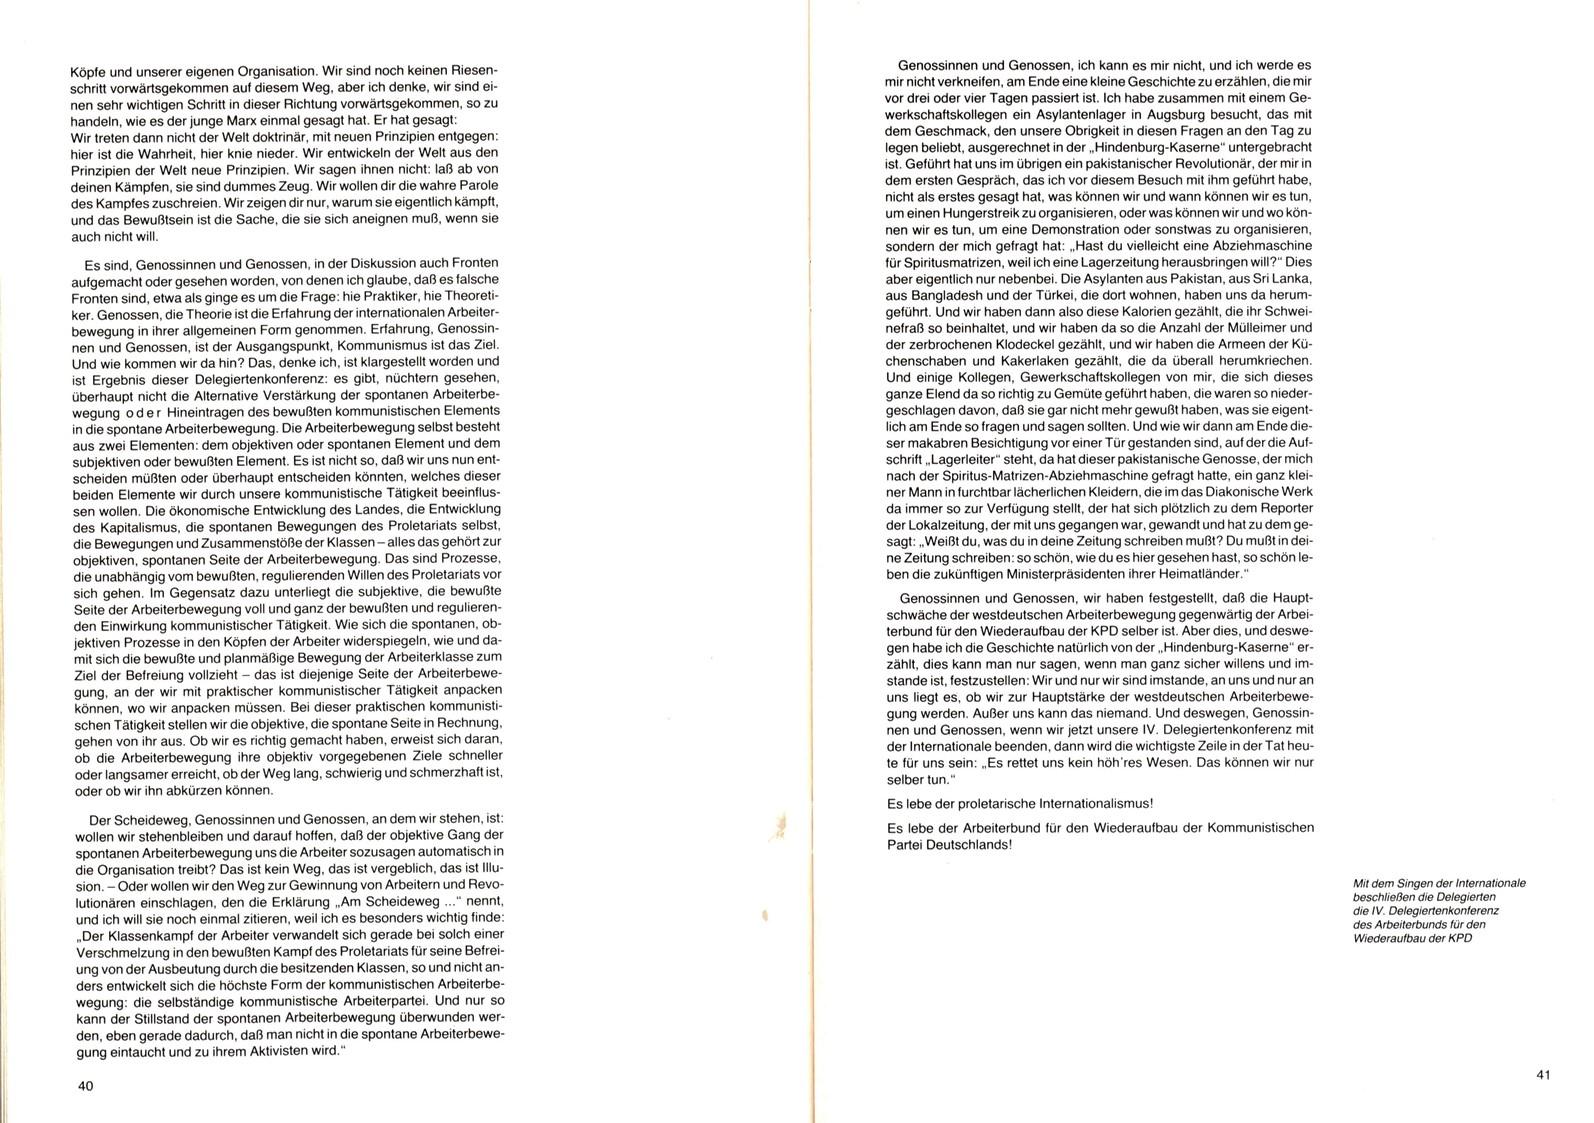 ABG_1985_Beschluesse_IV_Delegiertenkonferenz_22